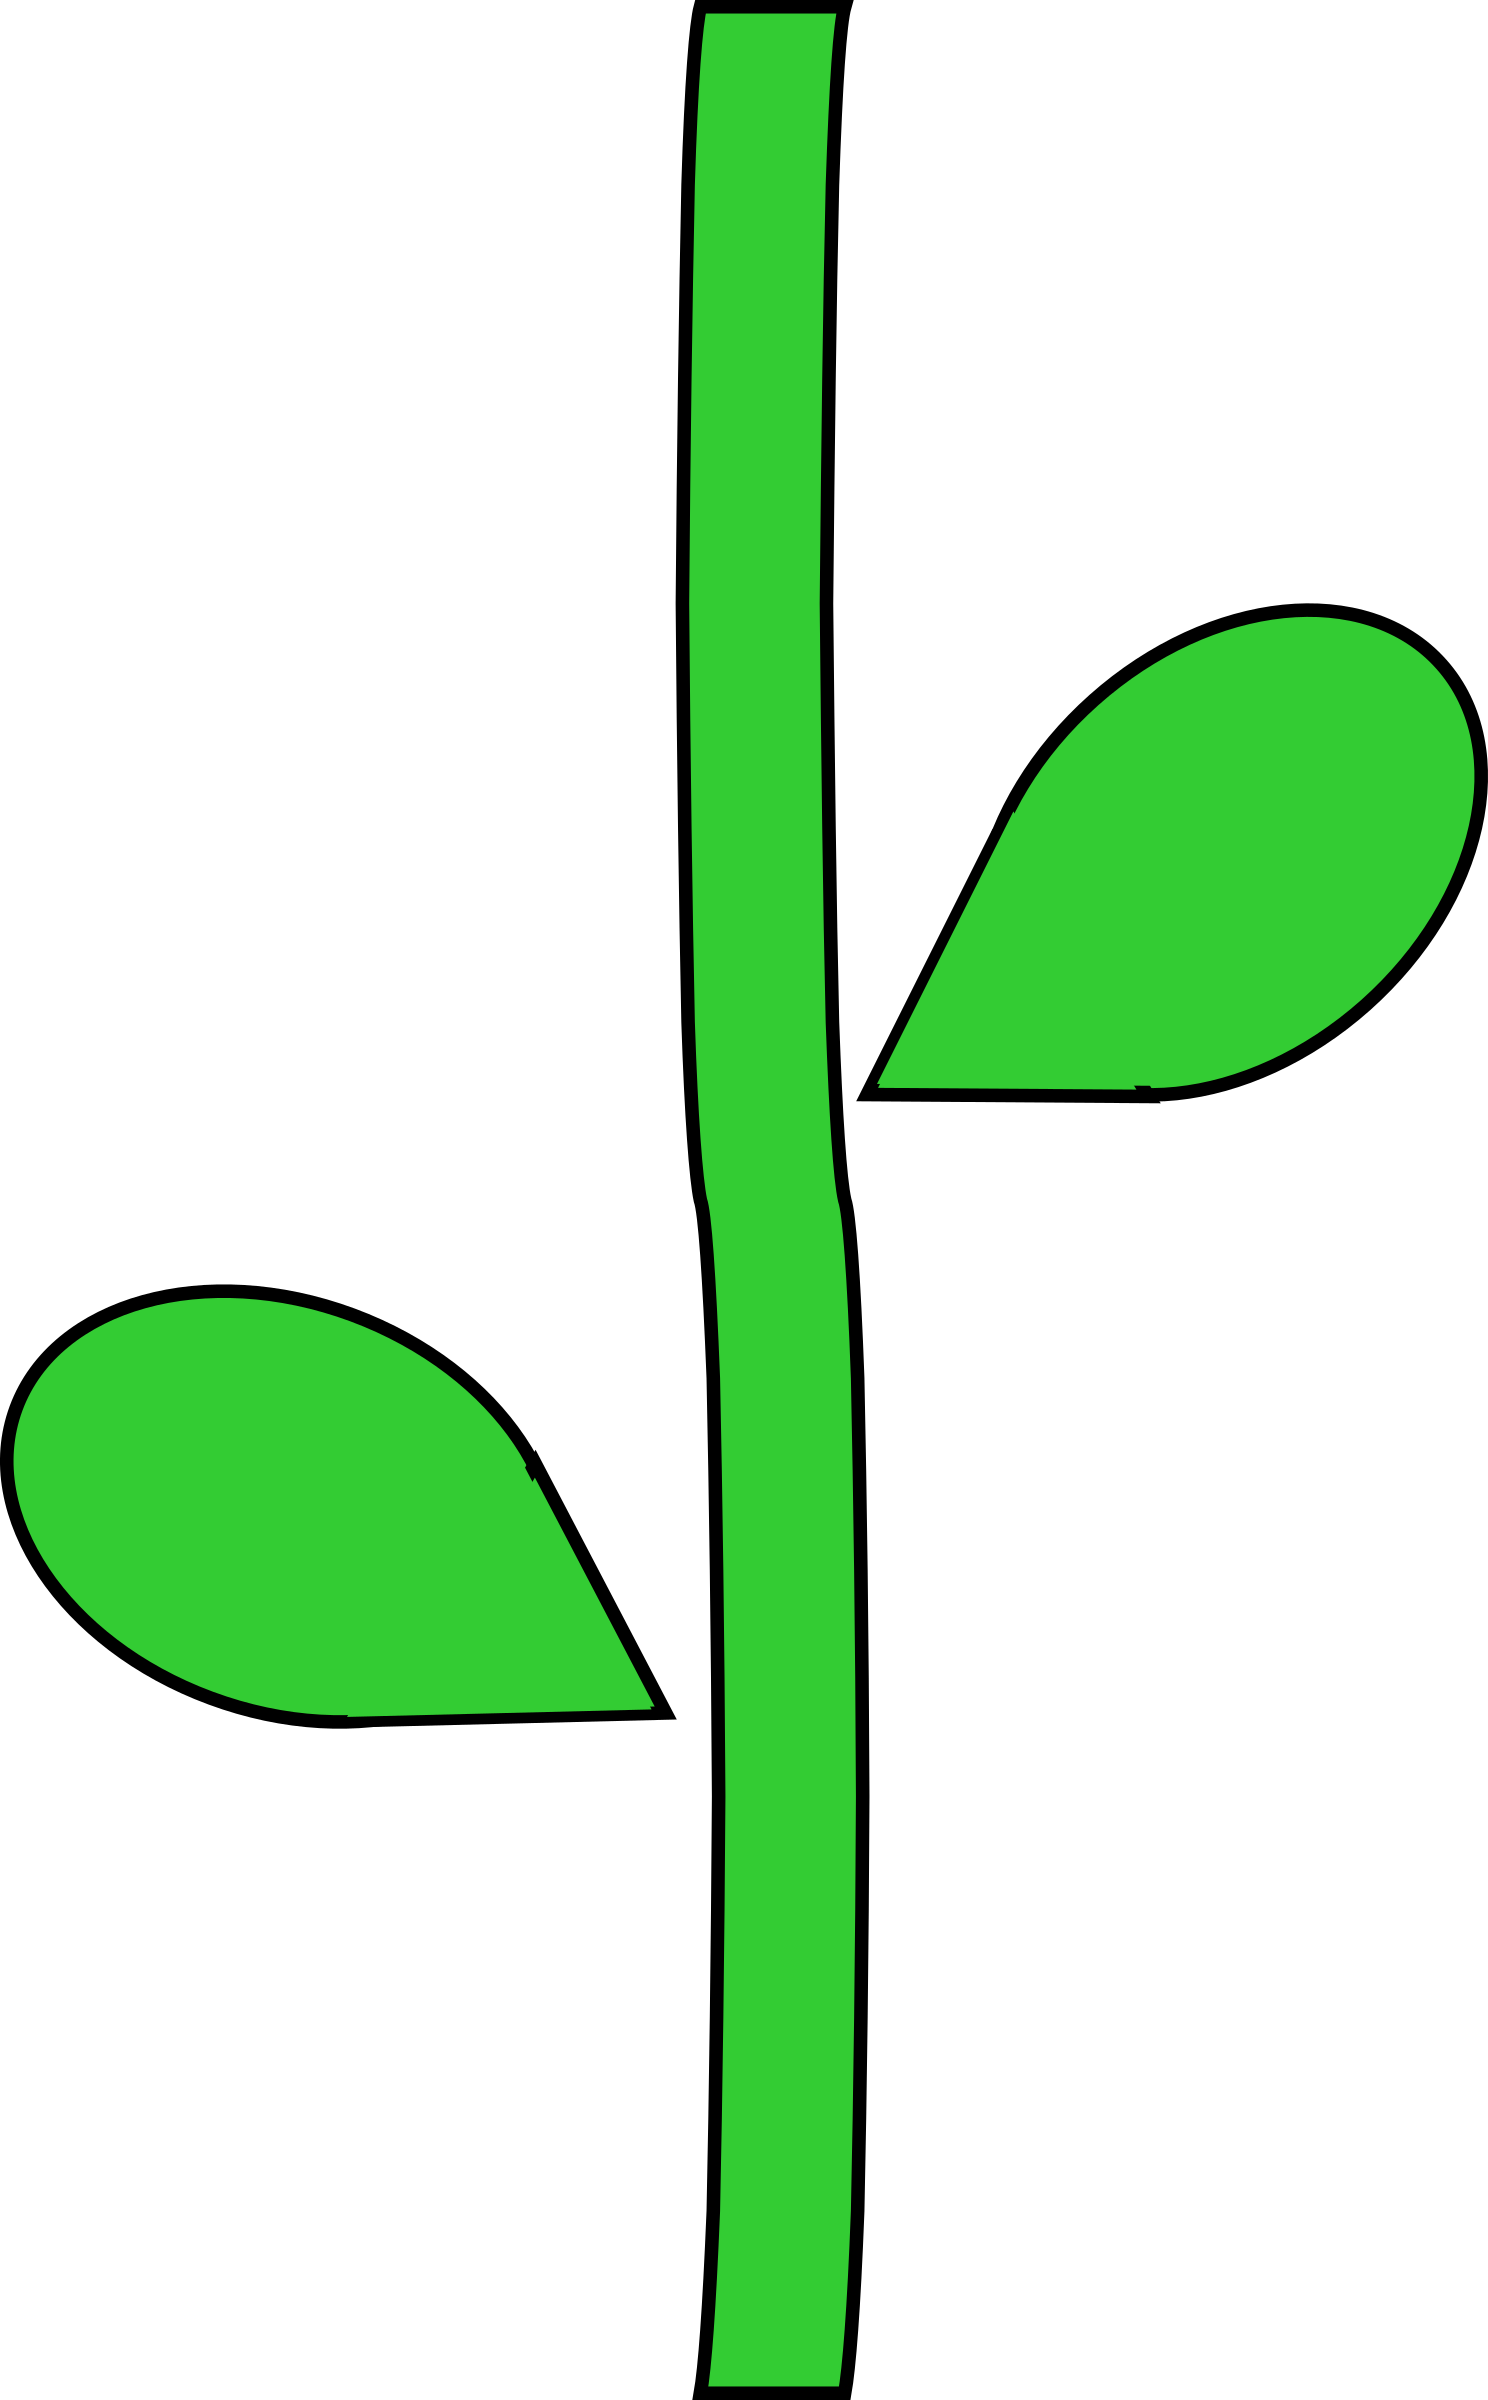 Stalk Clipart Png Clip Art Flower Stem.